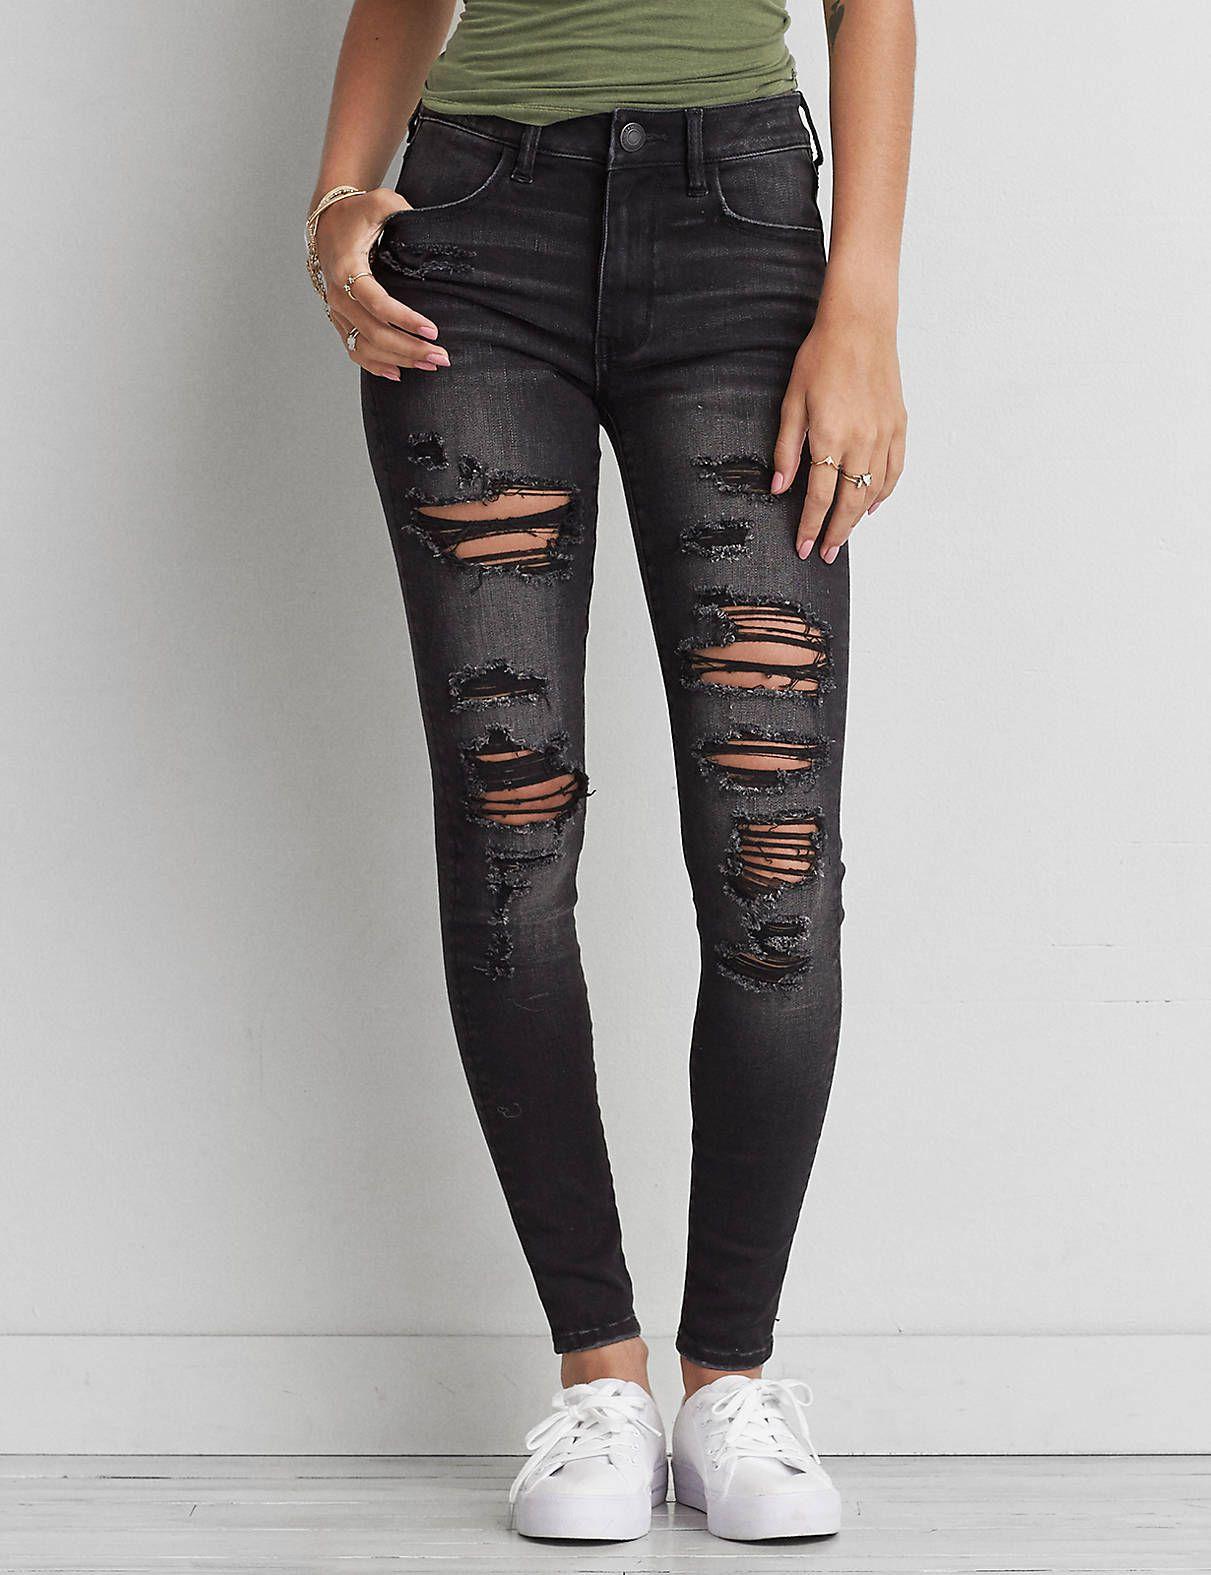 American Eagle Aeo Denim X Hi Rise Jegging In Black Slash 59 95 Cute Ripped Jeans American Eagle Ripped Jeans Black Ripped Jeans